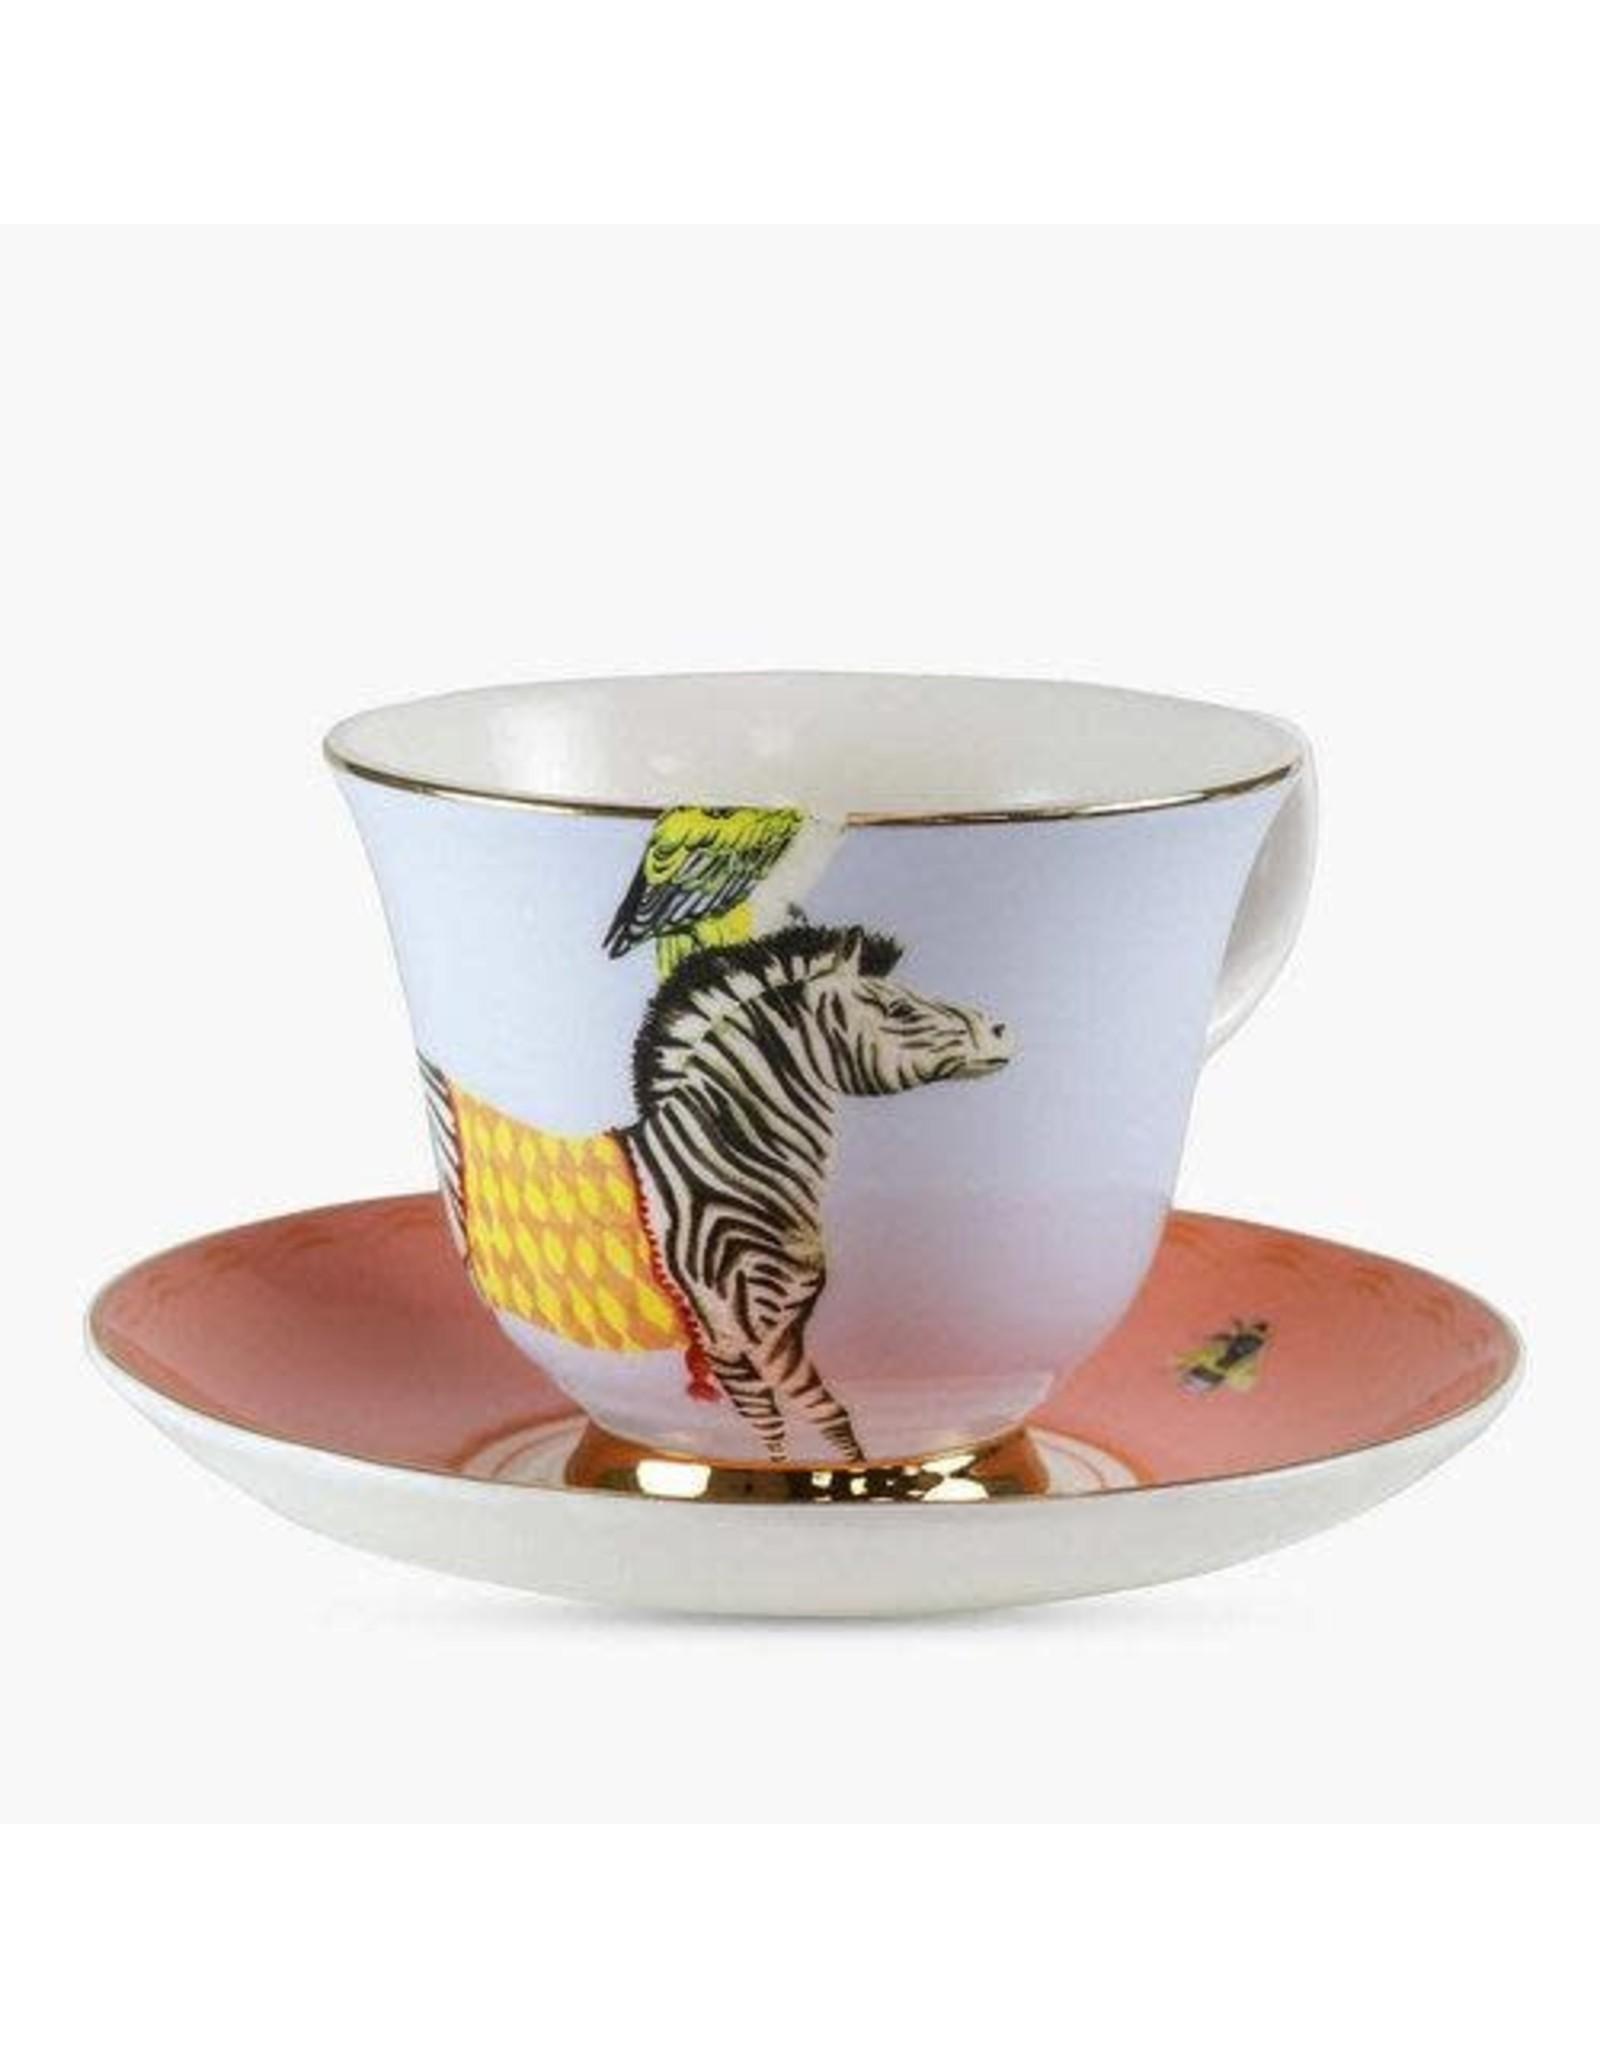 Yvonne Ellen Animals - Carnival Zebra Teacup & Saucer